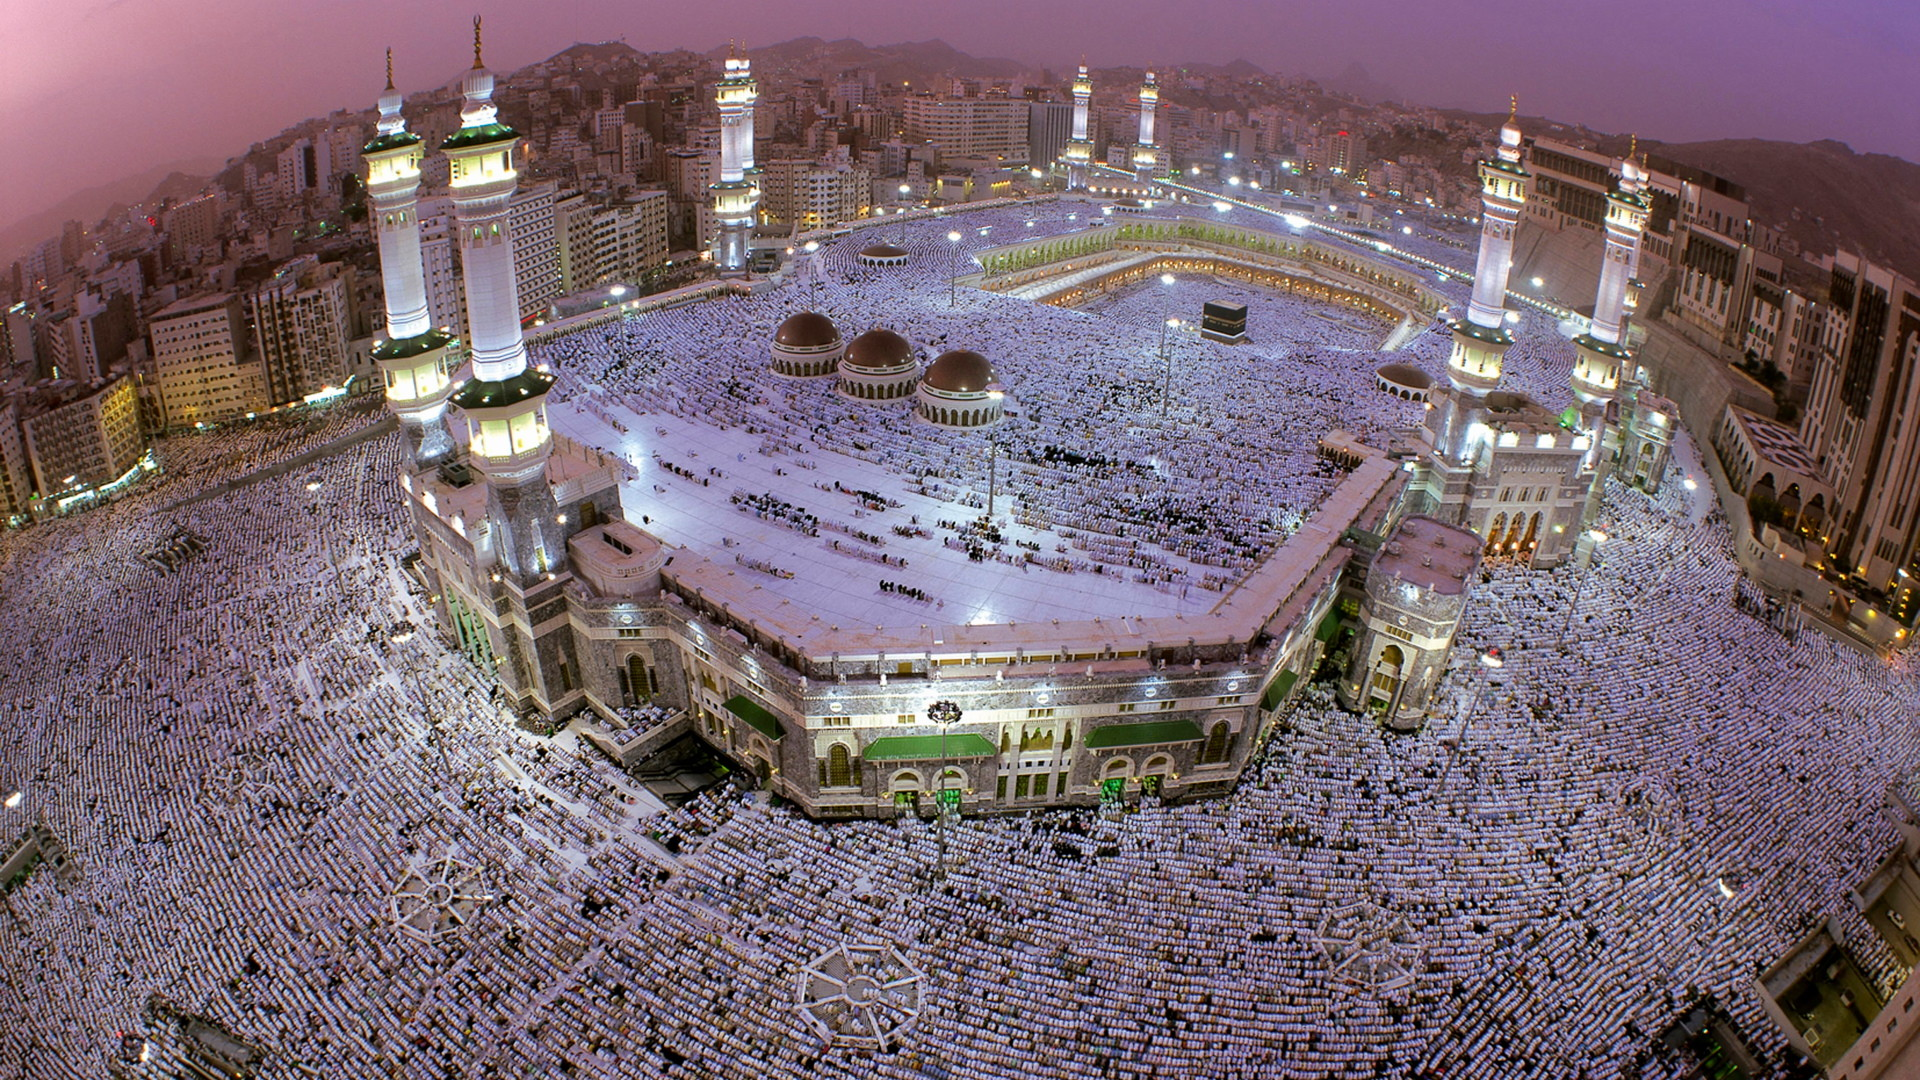 Res: 1920x1080, Wallpaper masjid al-haram kaaba mosque aerial view mecca